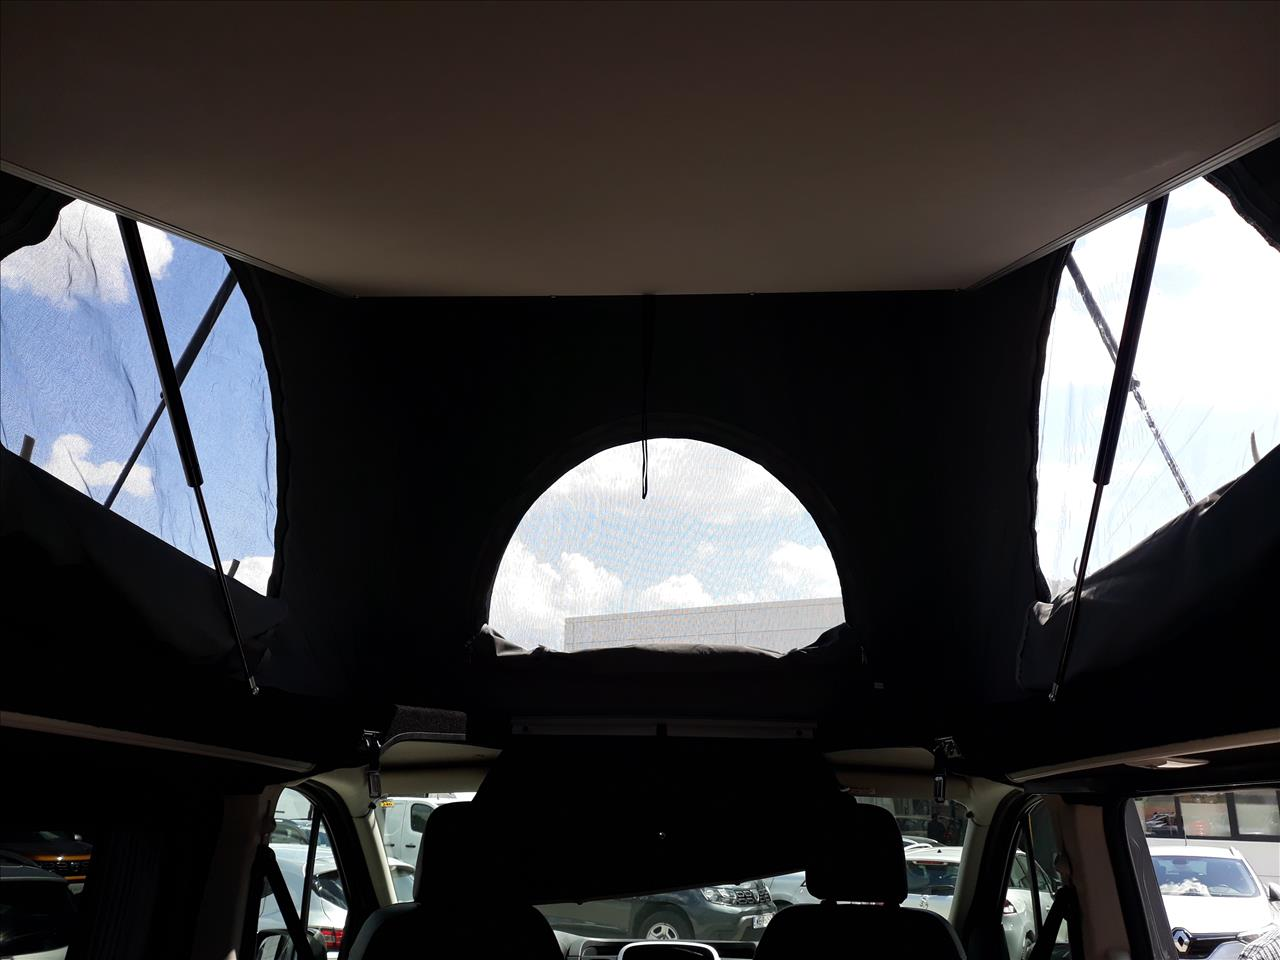 Renault TRAFIC Trafic 2.0 dCi L2H1 HD Pack Clim EDC (bryg.) 2020